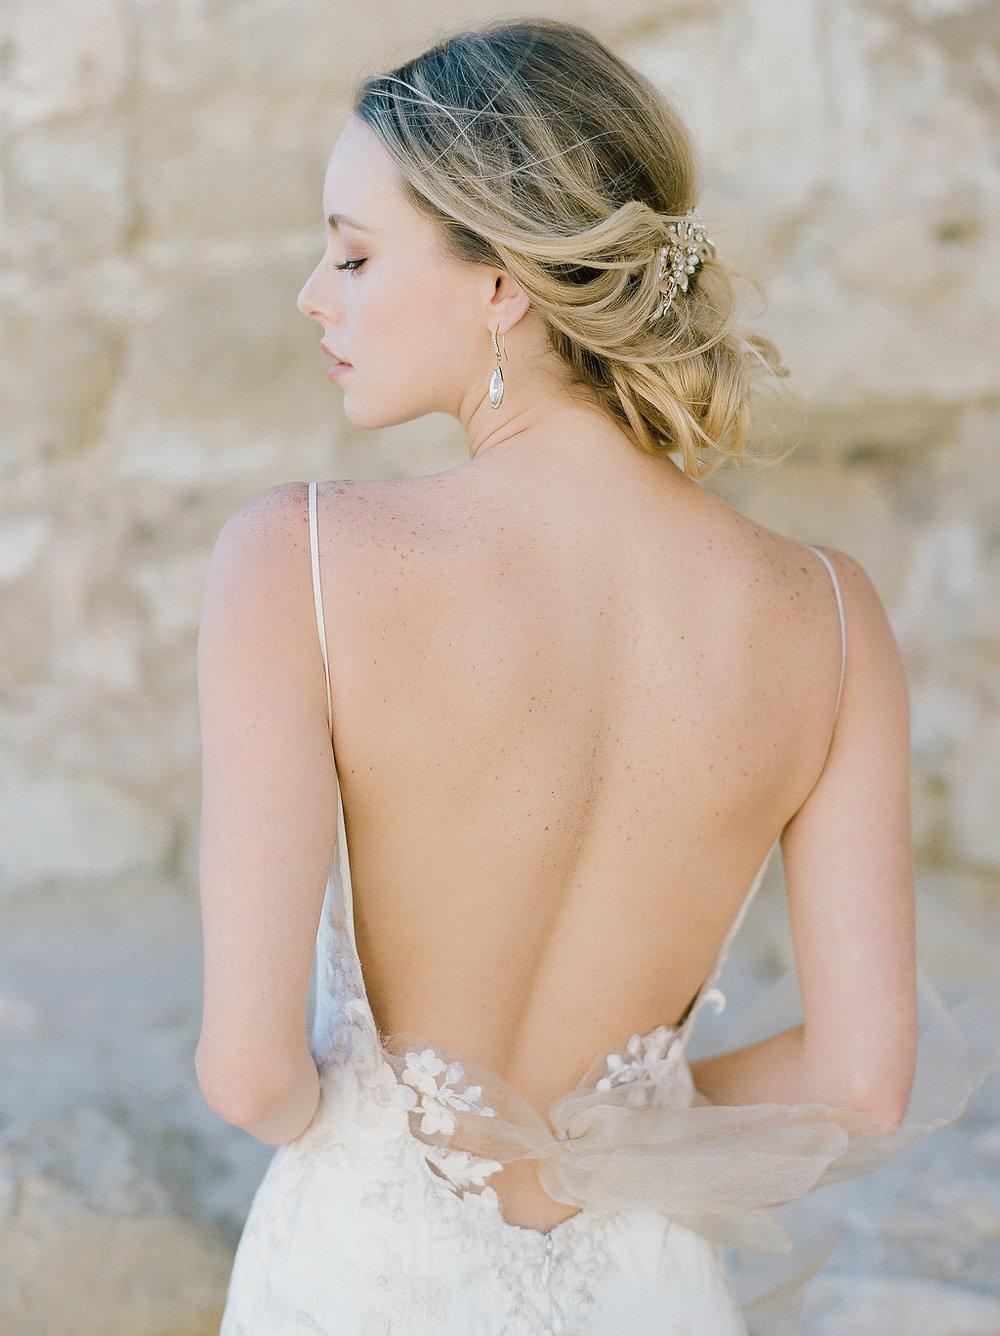 Spanish Mission Style Wedding Ideas Summer Flowers Finding Flora San Juan Capistrano European Venues California Wedding Dress Claire Pettibone Bridal Hair